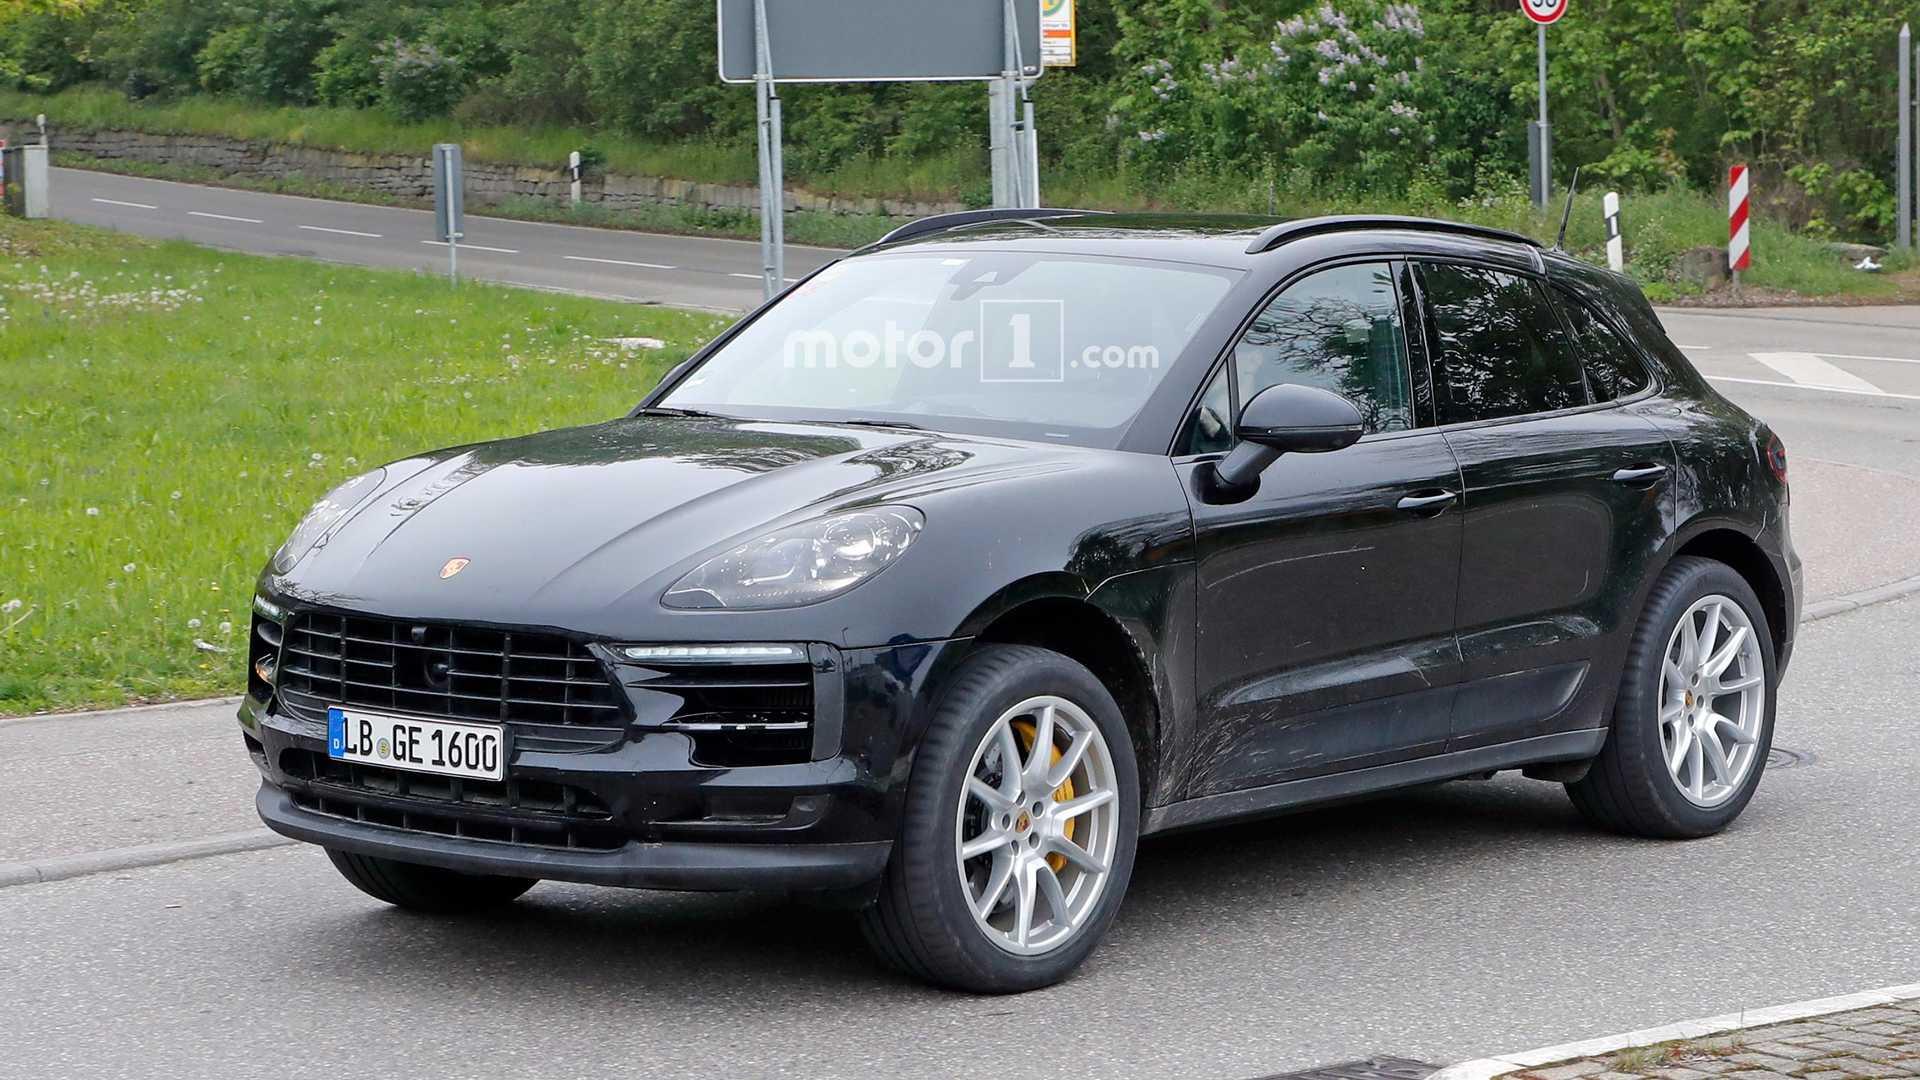 Porsche Macan SPY 2018